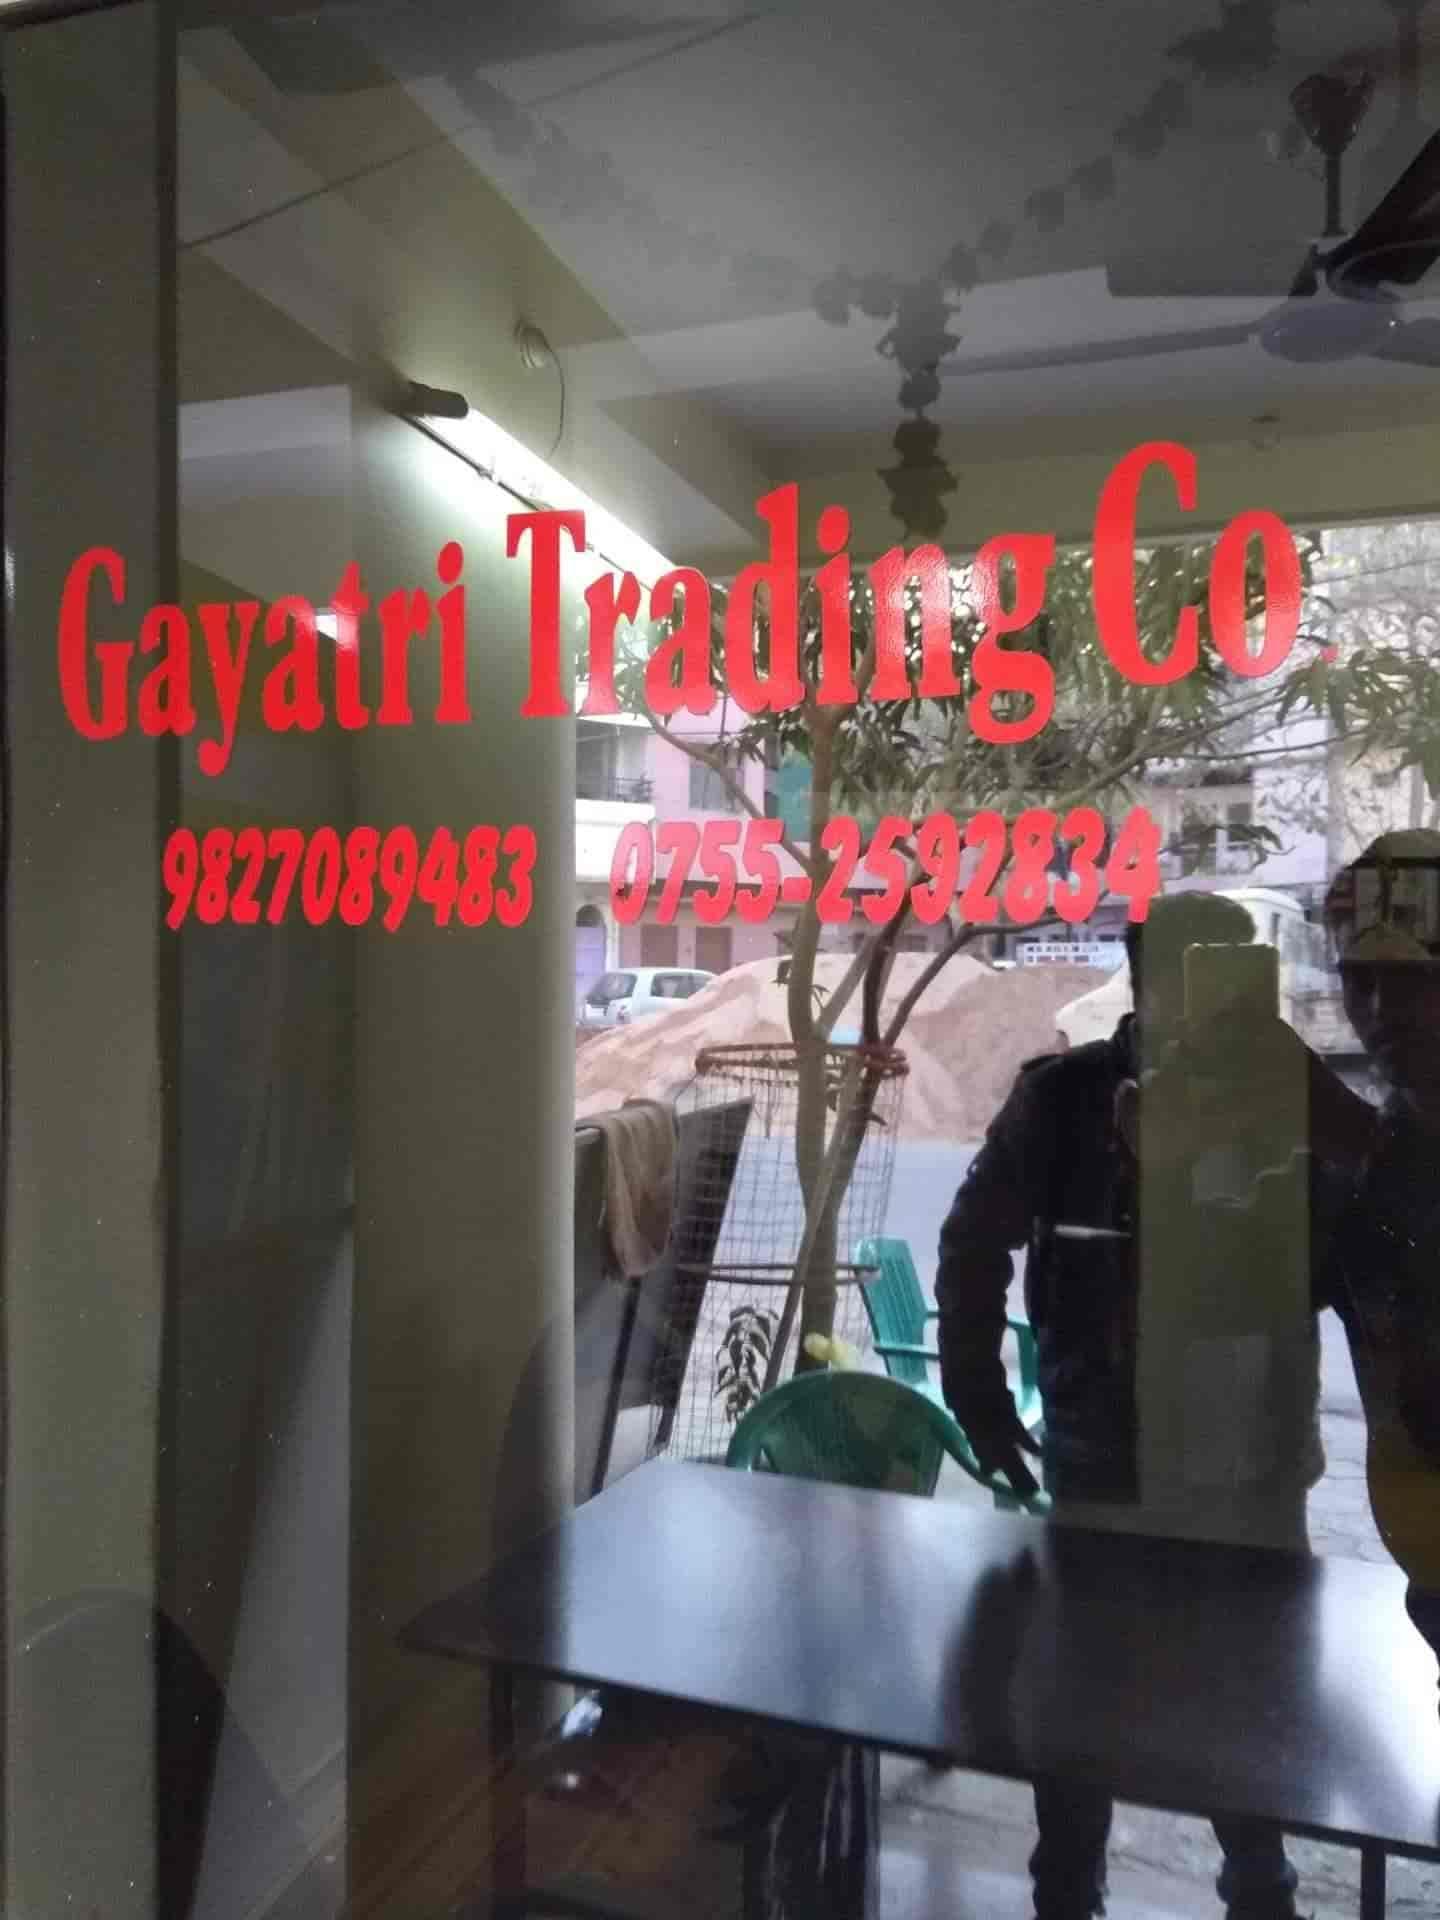 Gayatri Trading Company, Ashoka Garden - Cement Dealers in